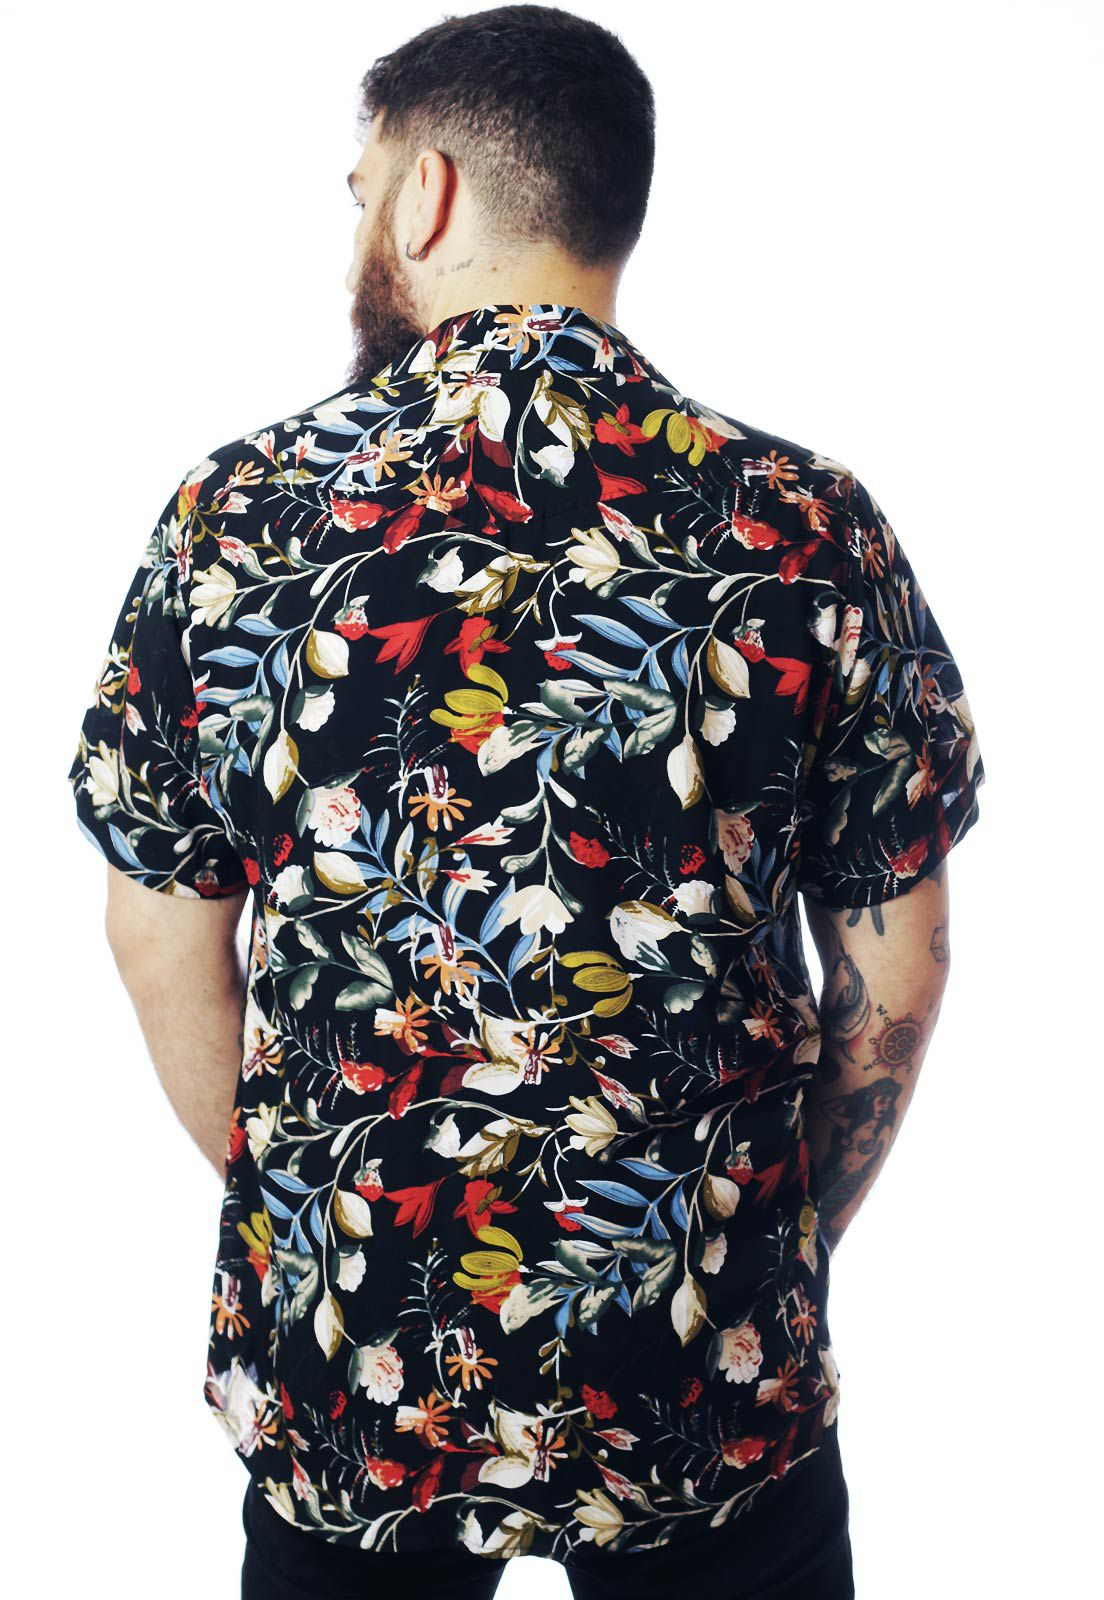 Camisa Floral Estampada ElephunK Mistério Preta